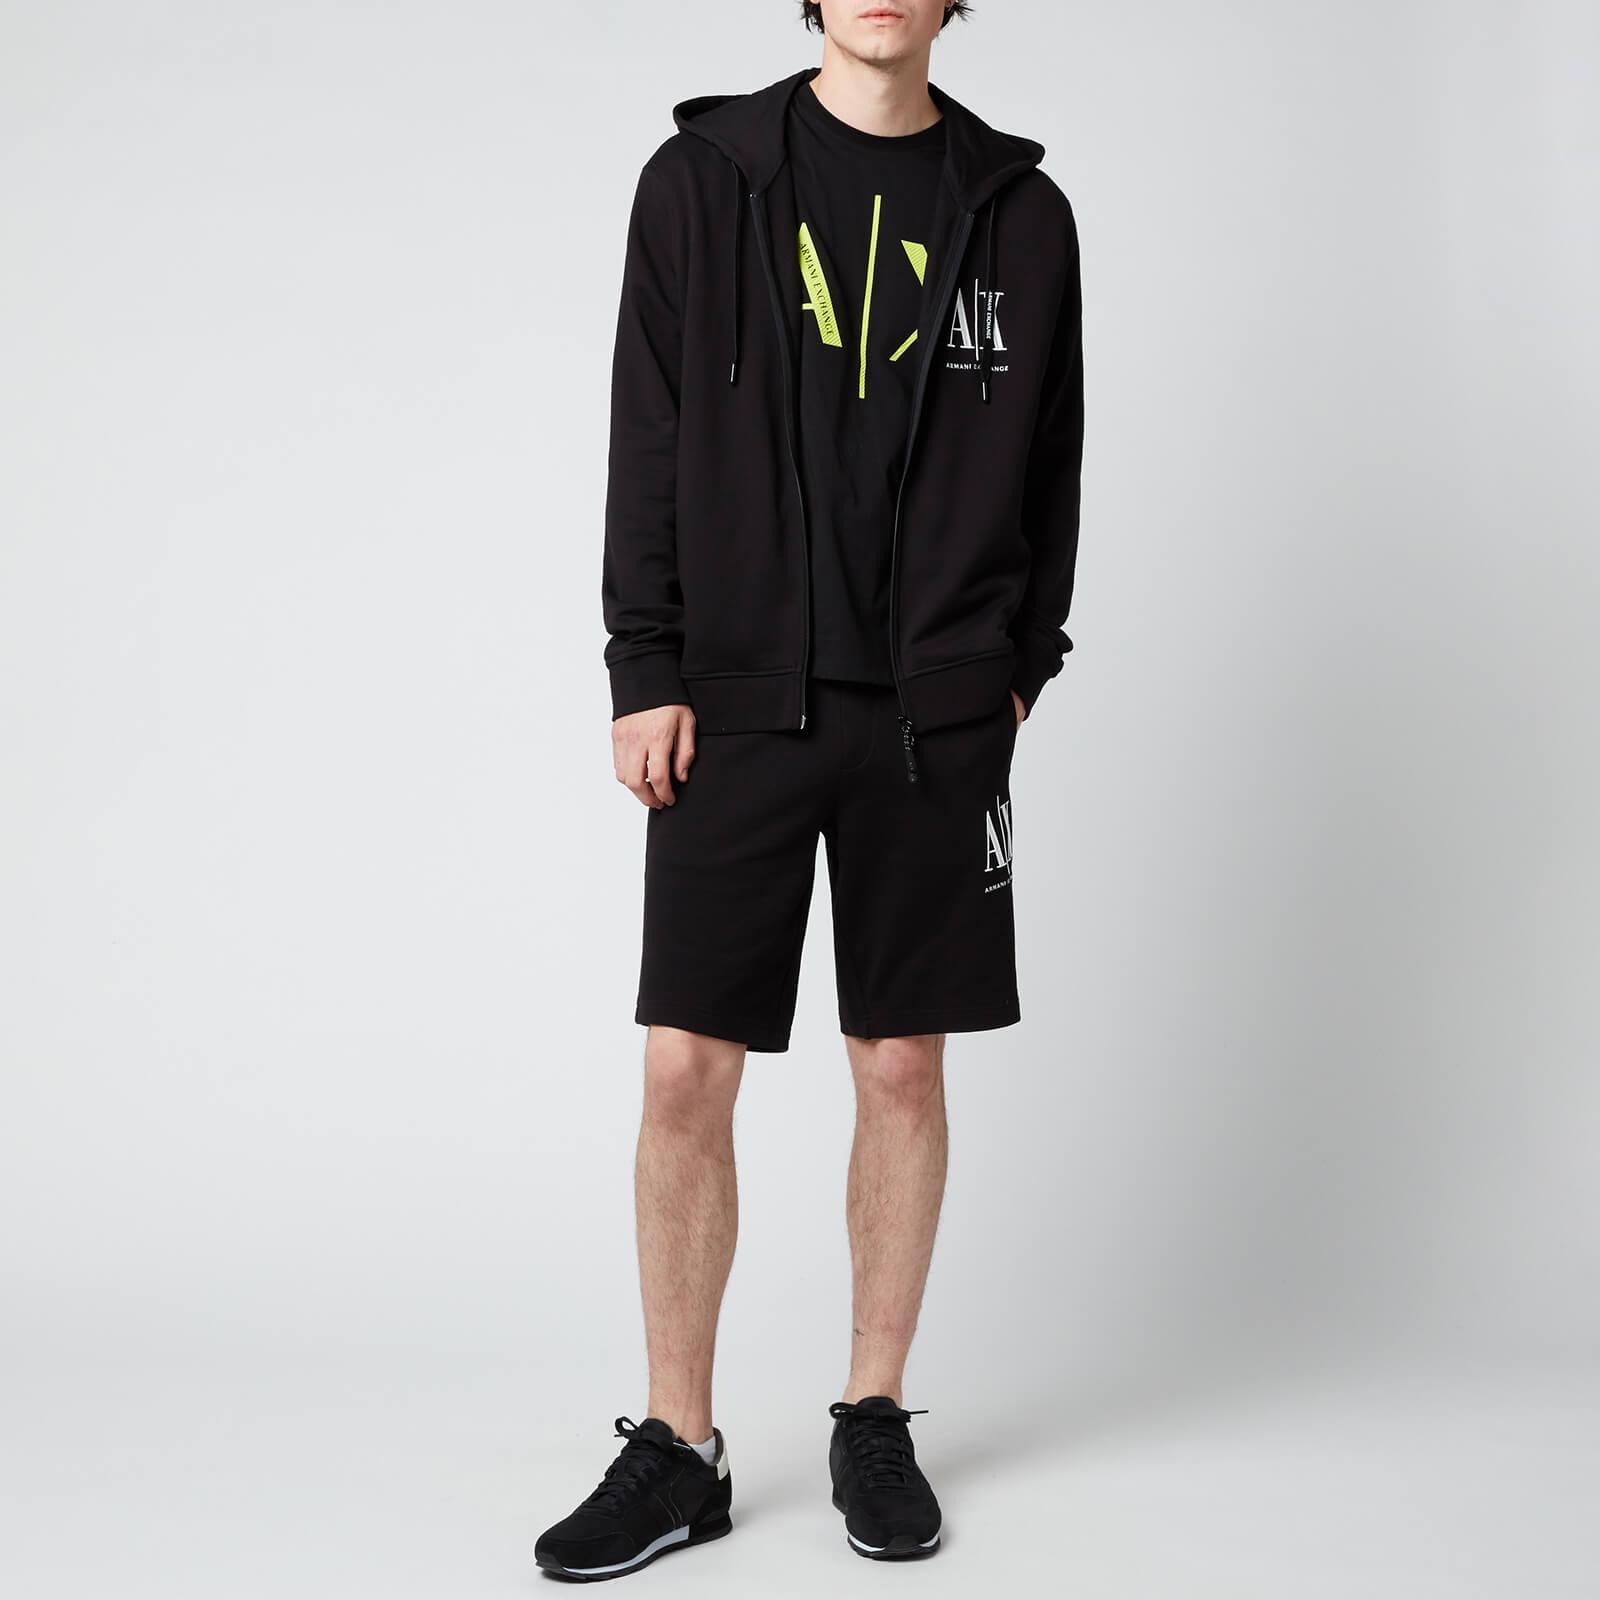 Armani Exchange Men's Ax Logo Zip Hoodie - Black - S